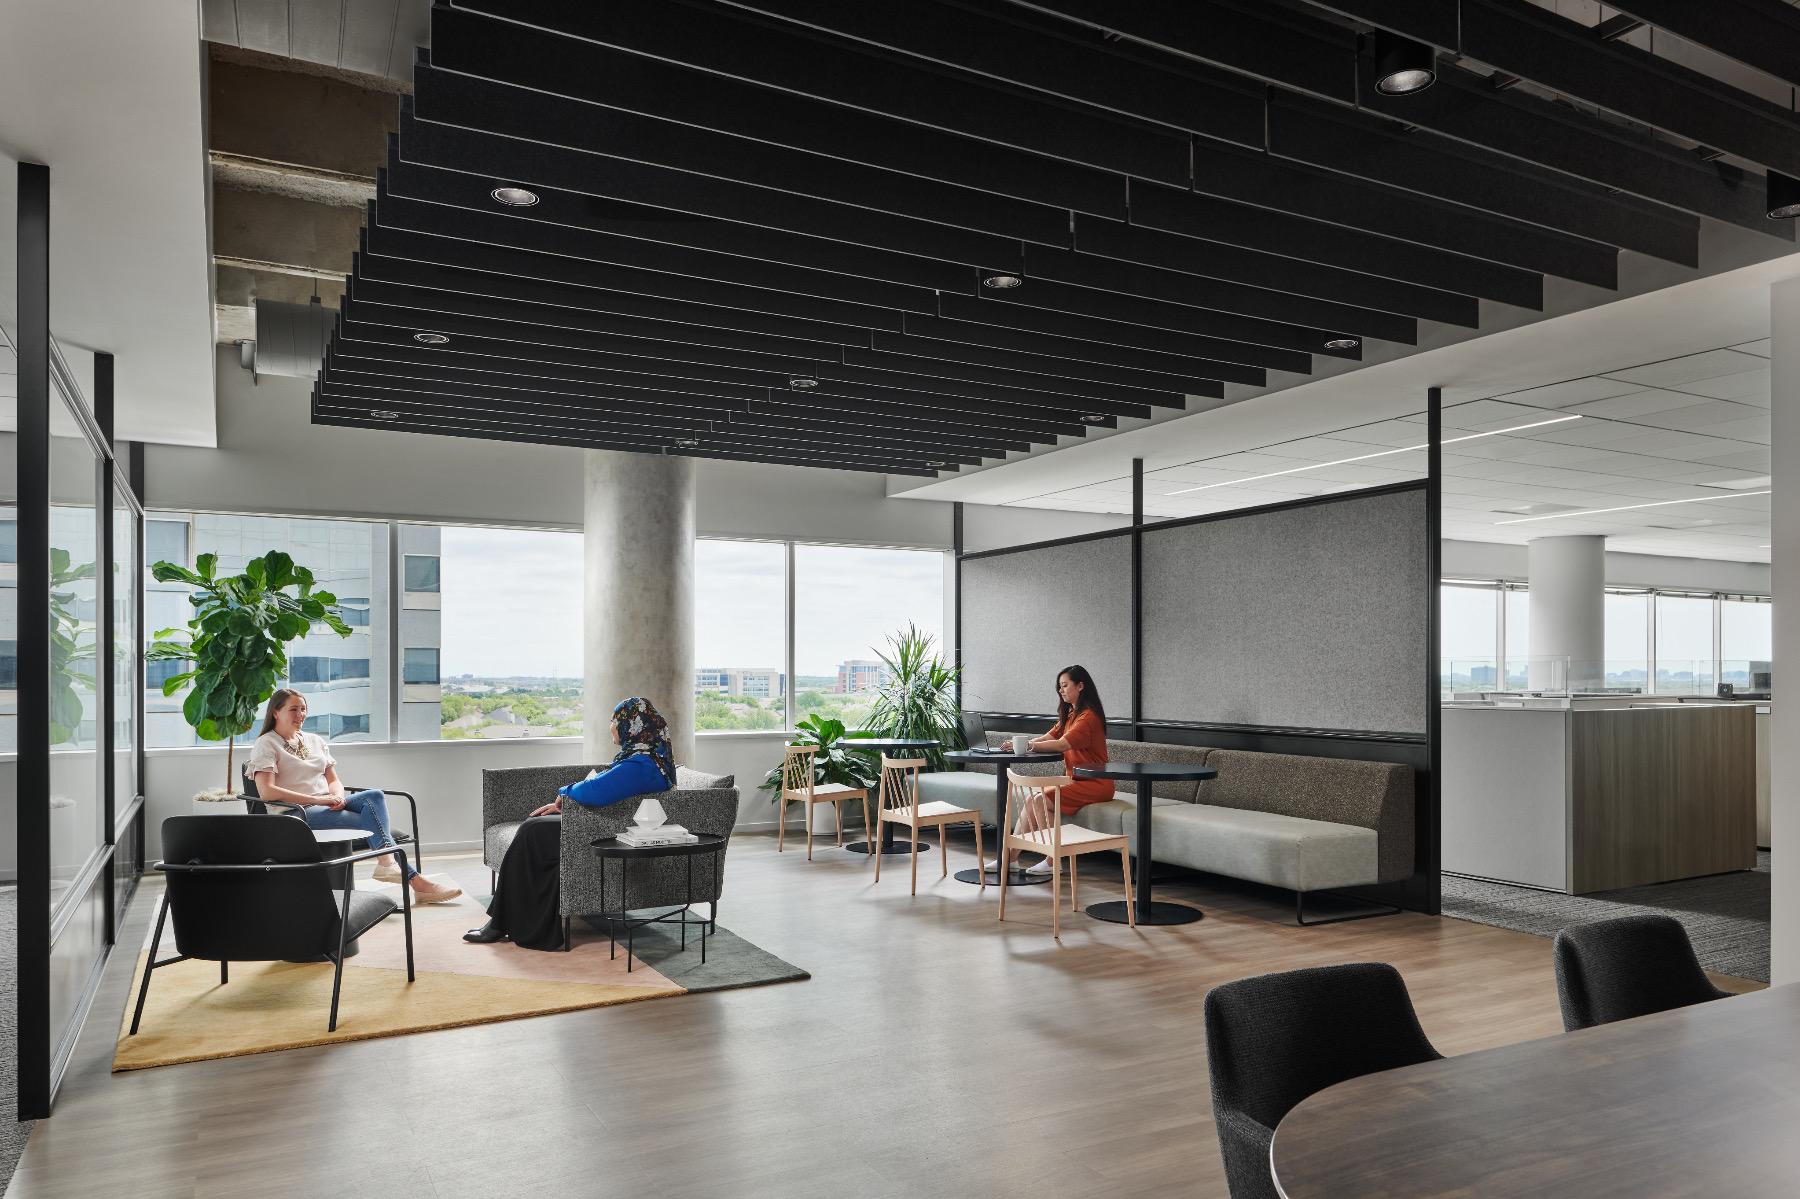 A Look Inside Digital Matrix Systems' New Plano Office